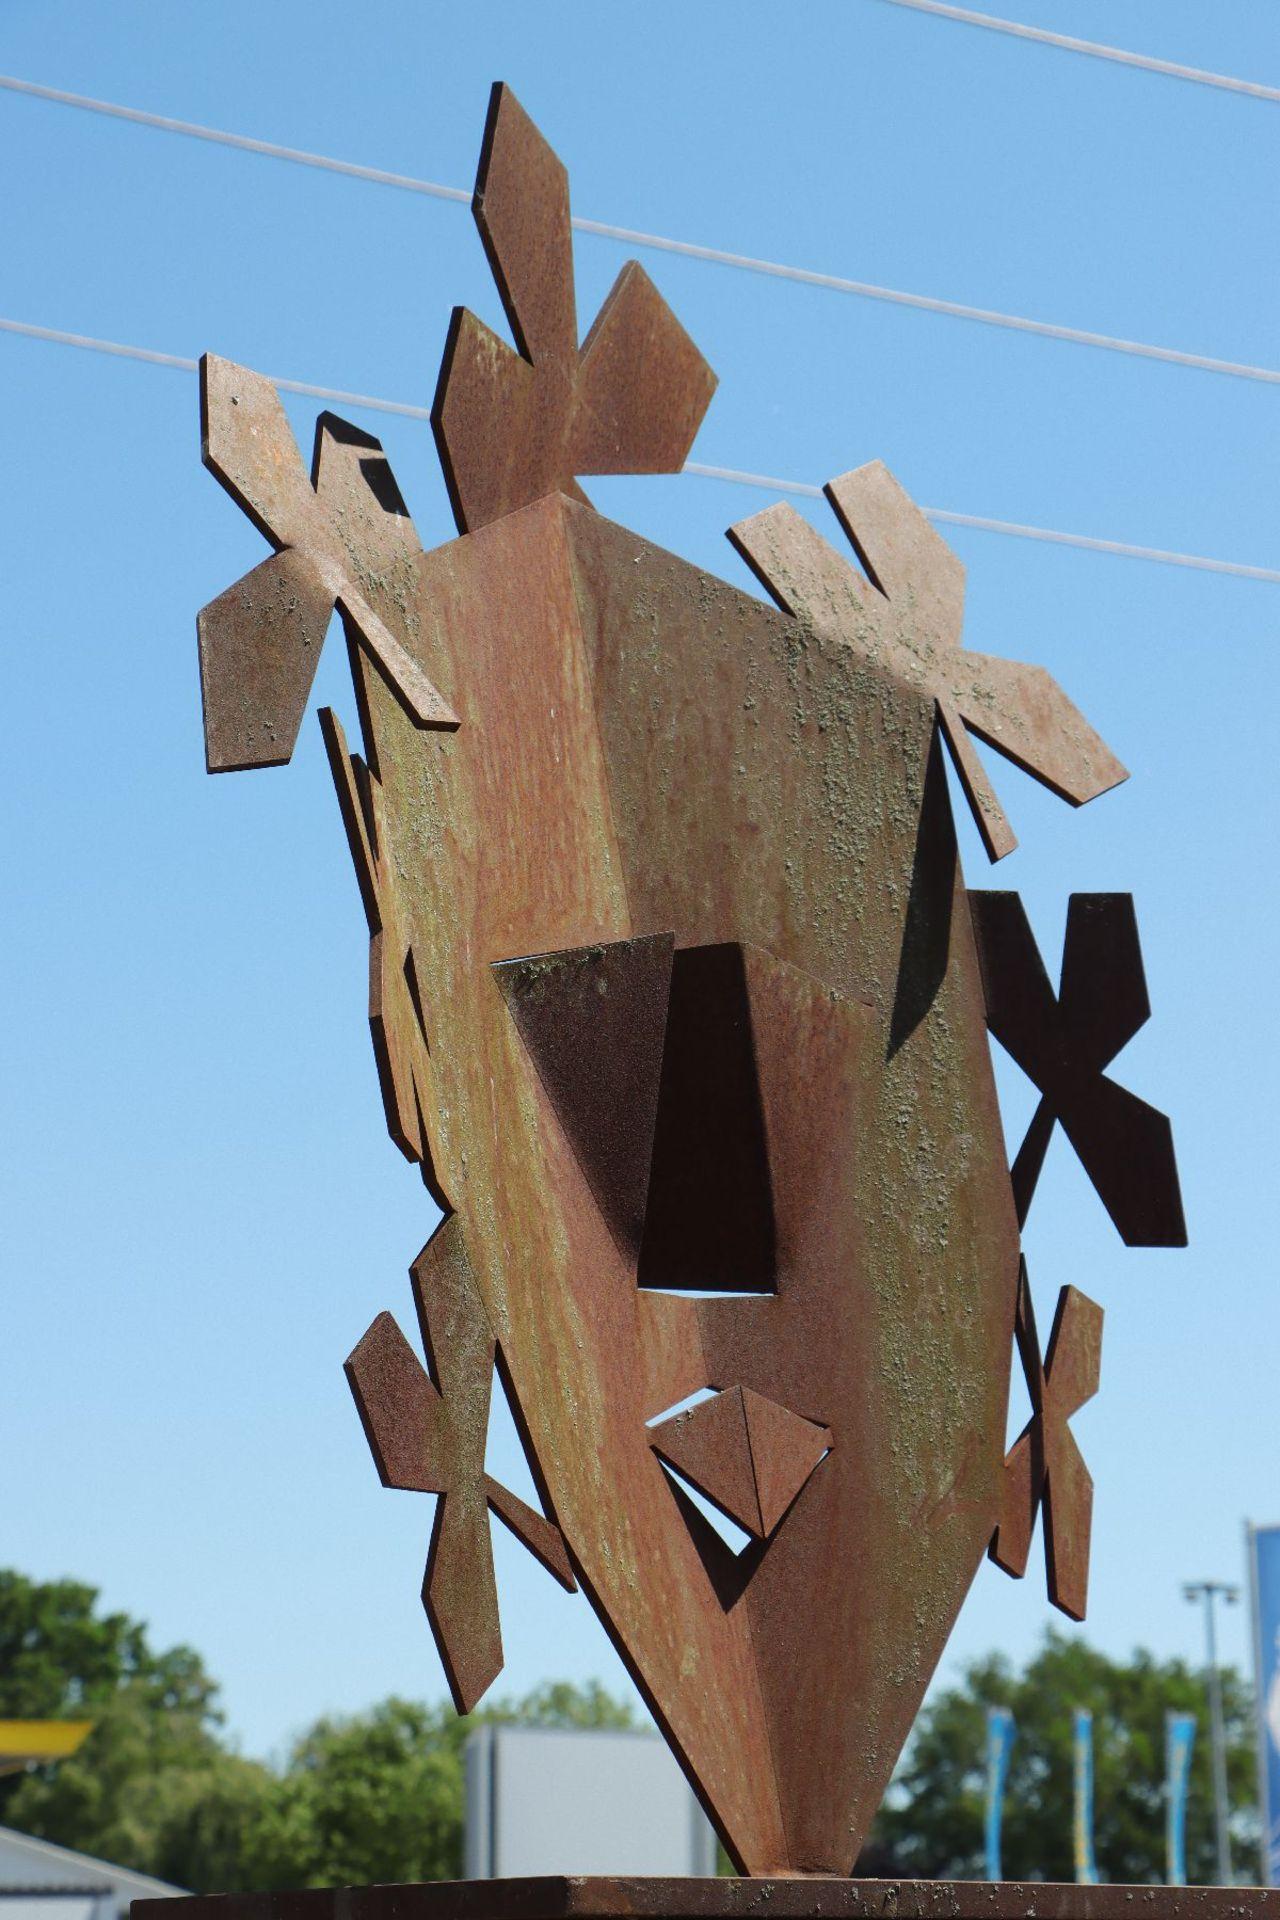 Skulptur auf Podest, Andreas Helmling, Eisen geschmiedet - Image 3 of 3